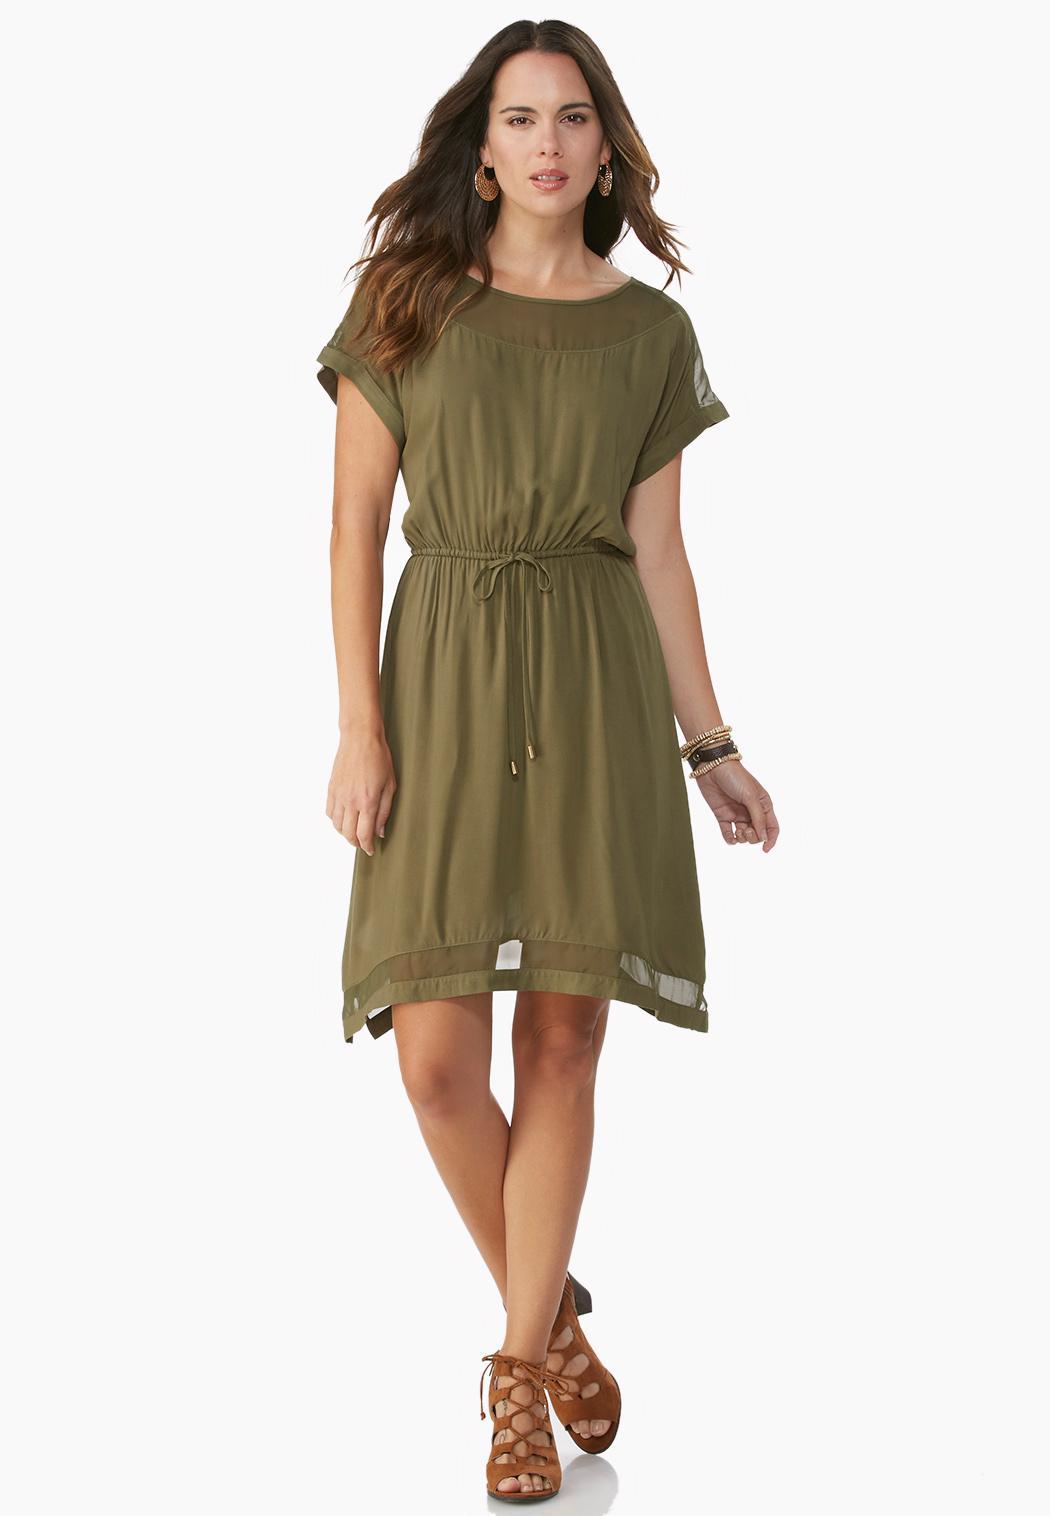 Summer Dresses On Sale For Juniors